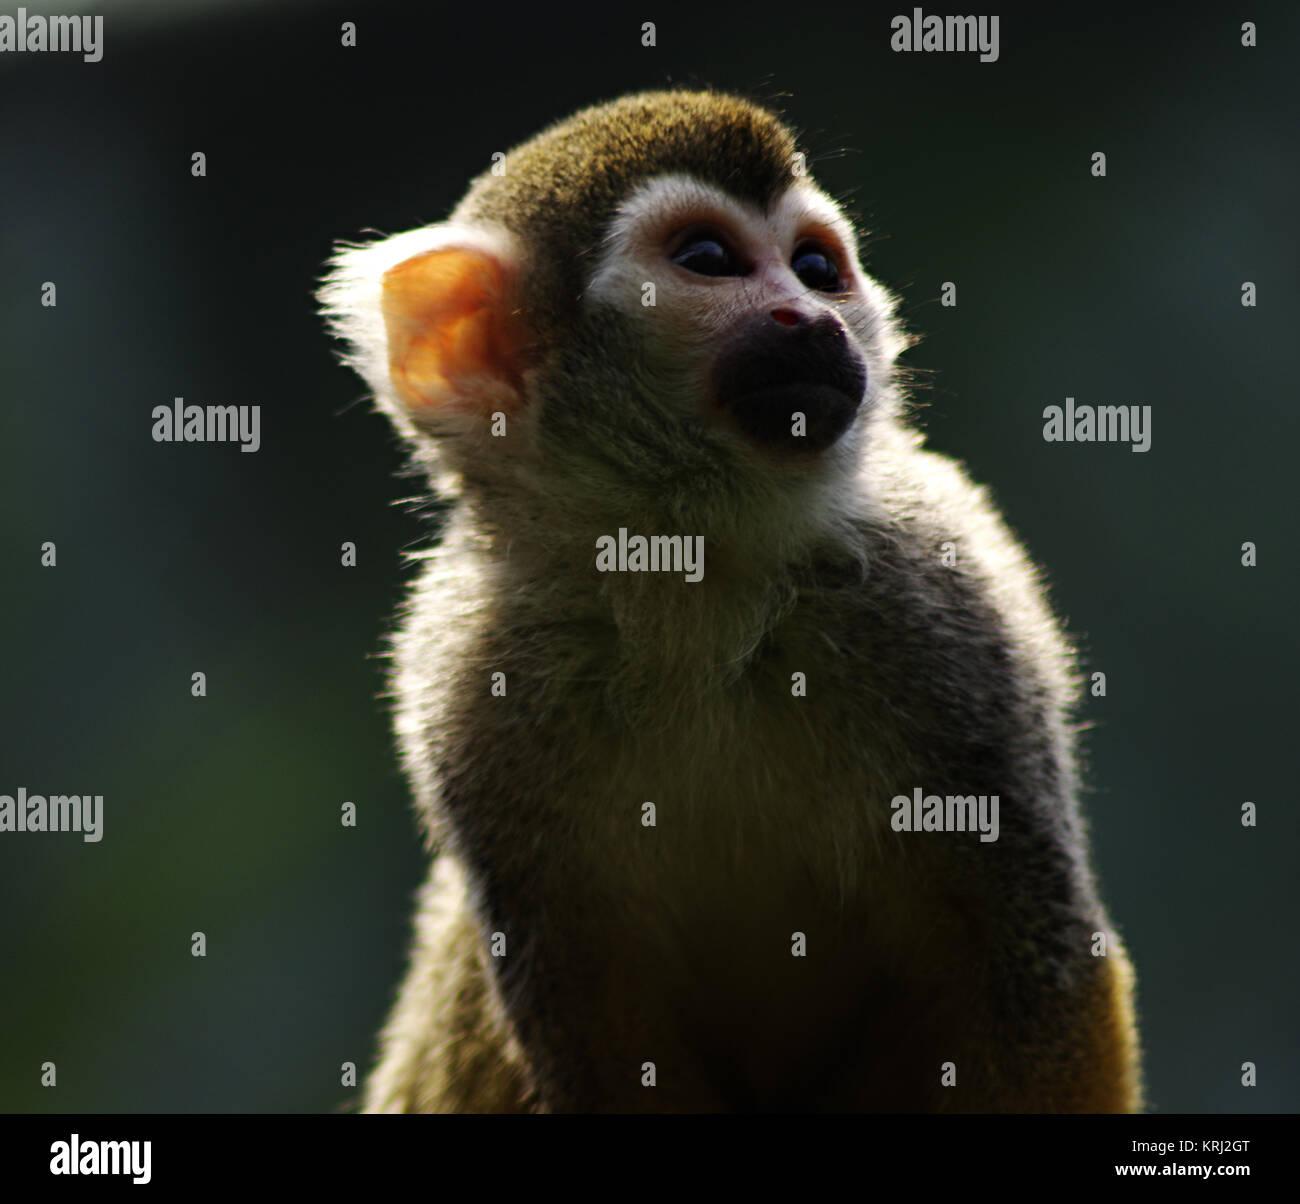 Squirrel monkeys in trees - photo#42